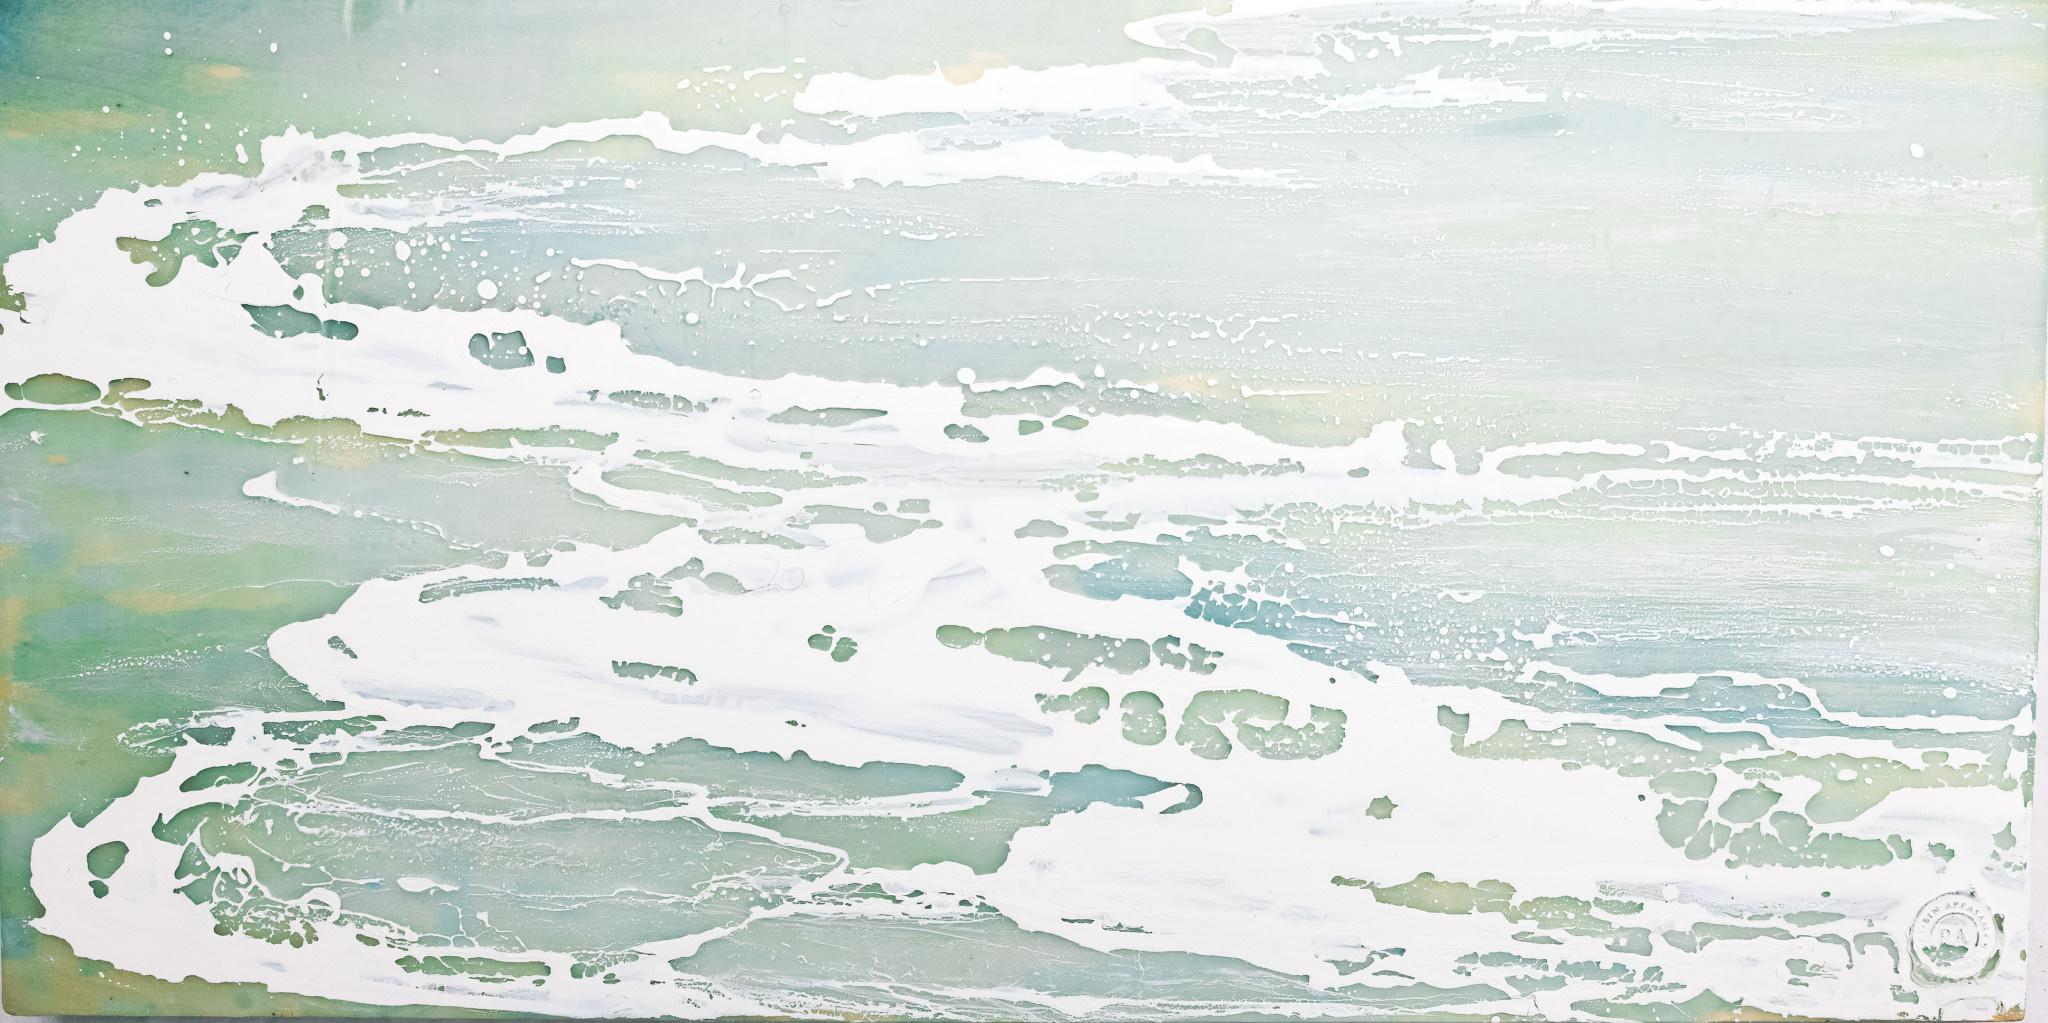 Robin Appasamy Fresh Water 04, 12x24 Original Encaustic Painting